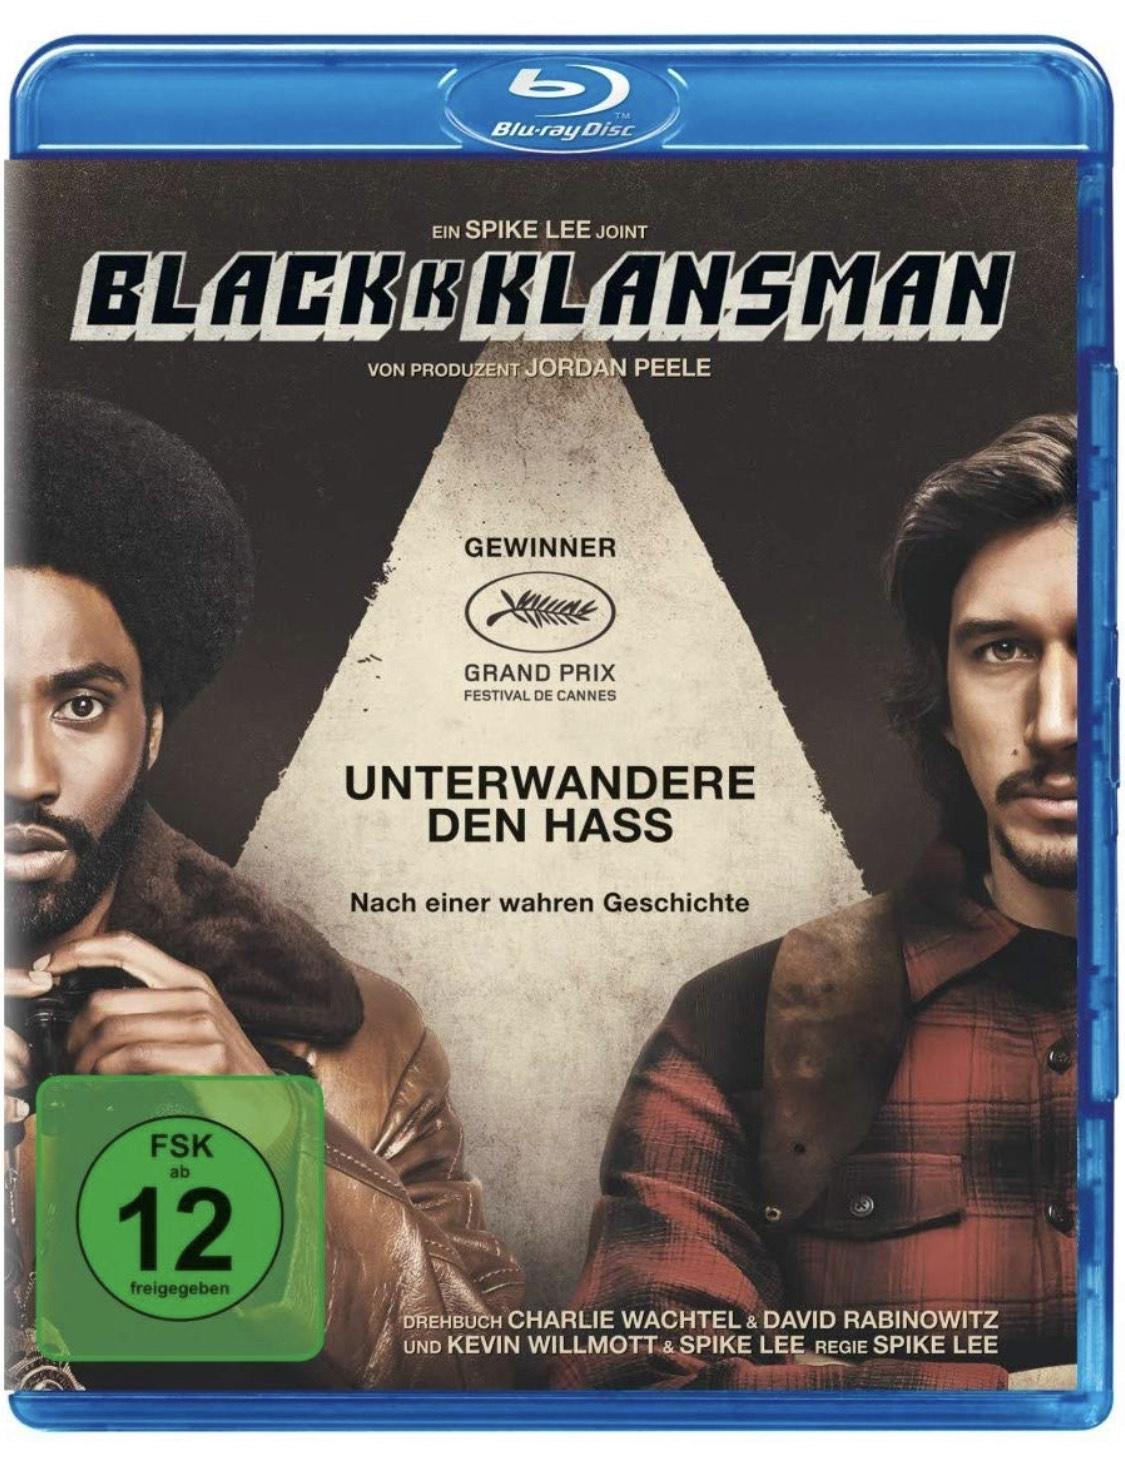 BLACKkKLANSMAN - Bluray